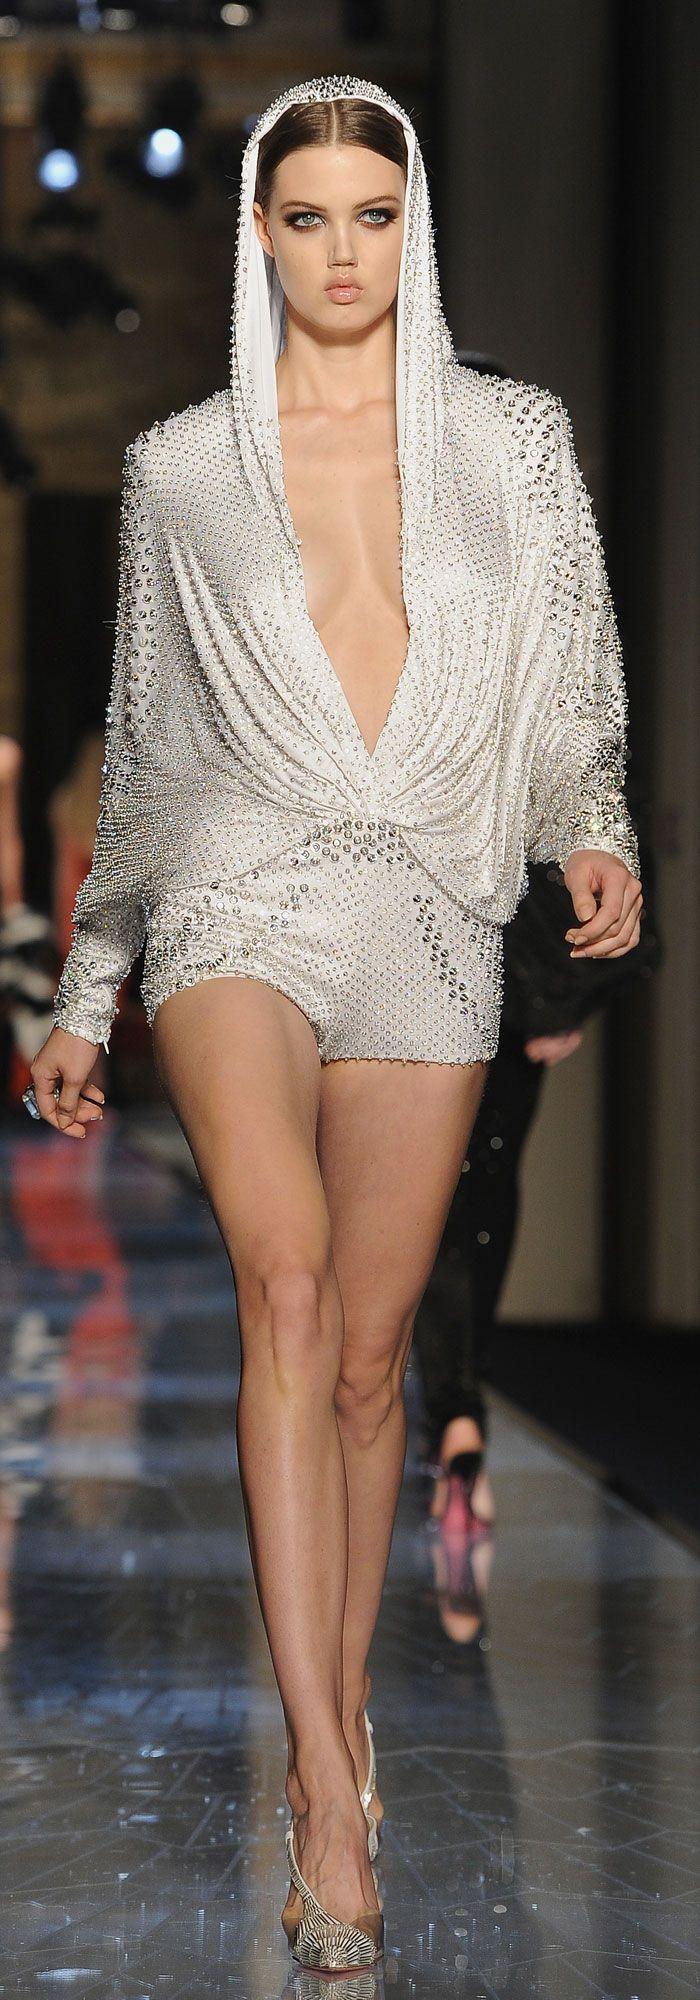 Atelier Versace's Spring 2014 ~ Cynthia Reccord